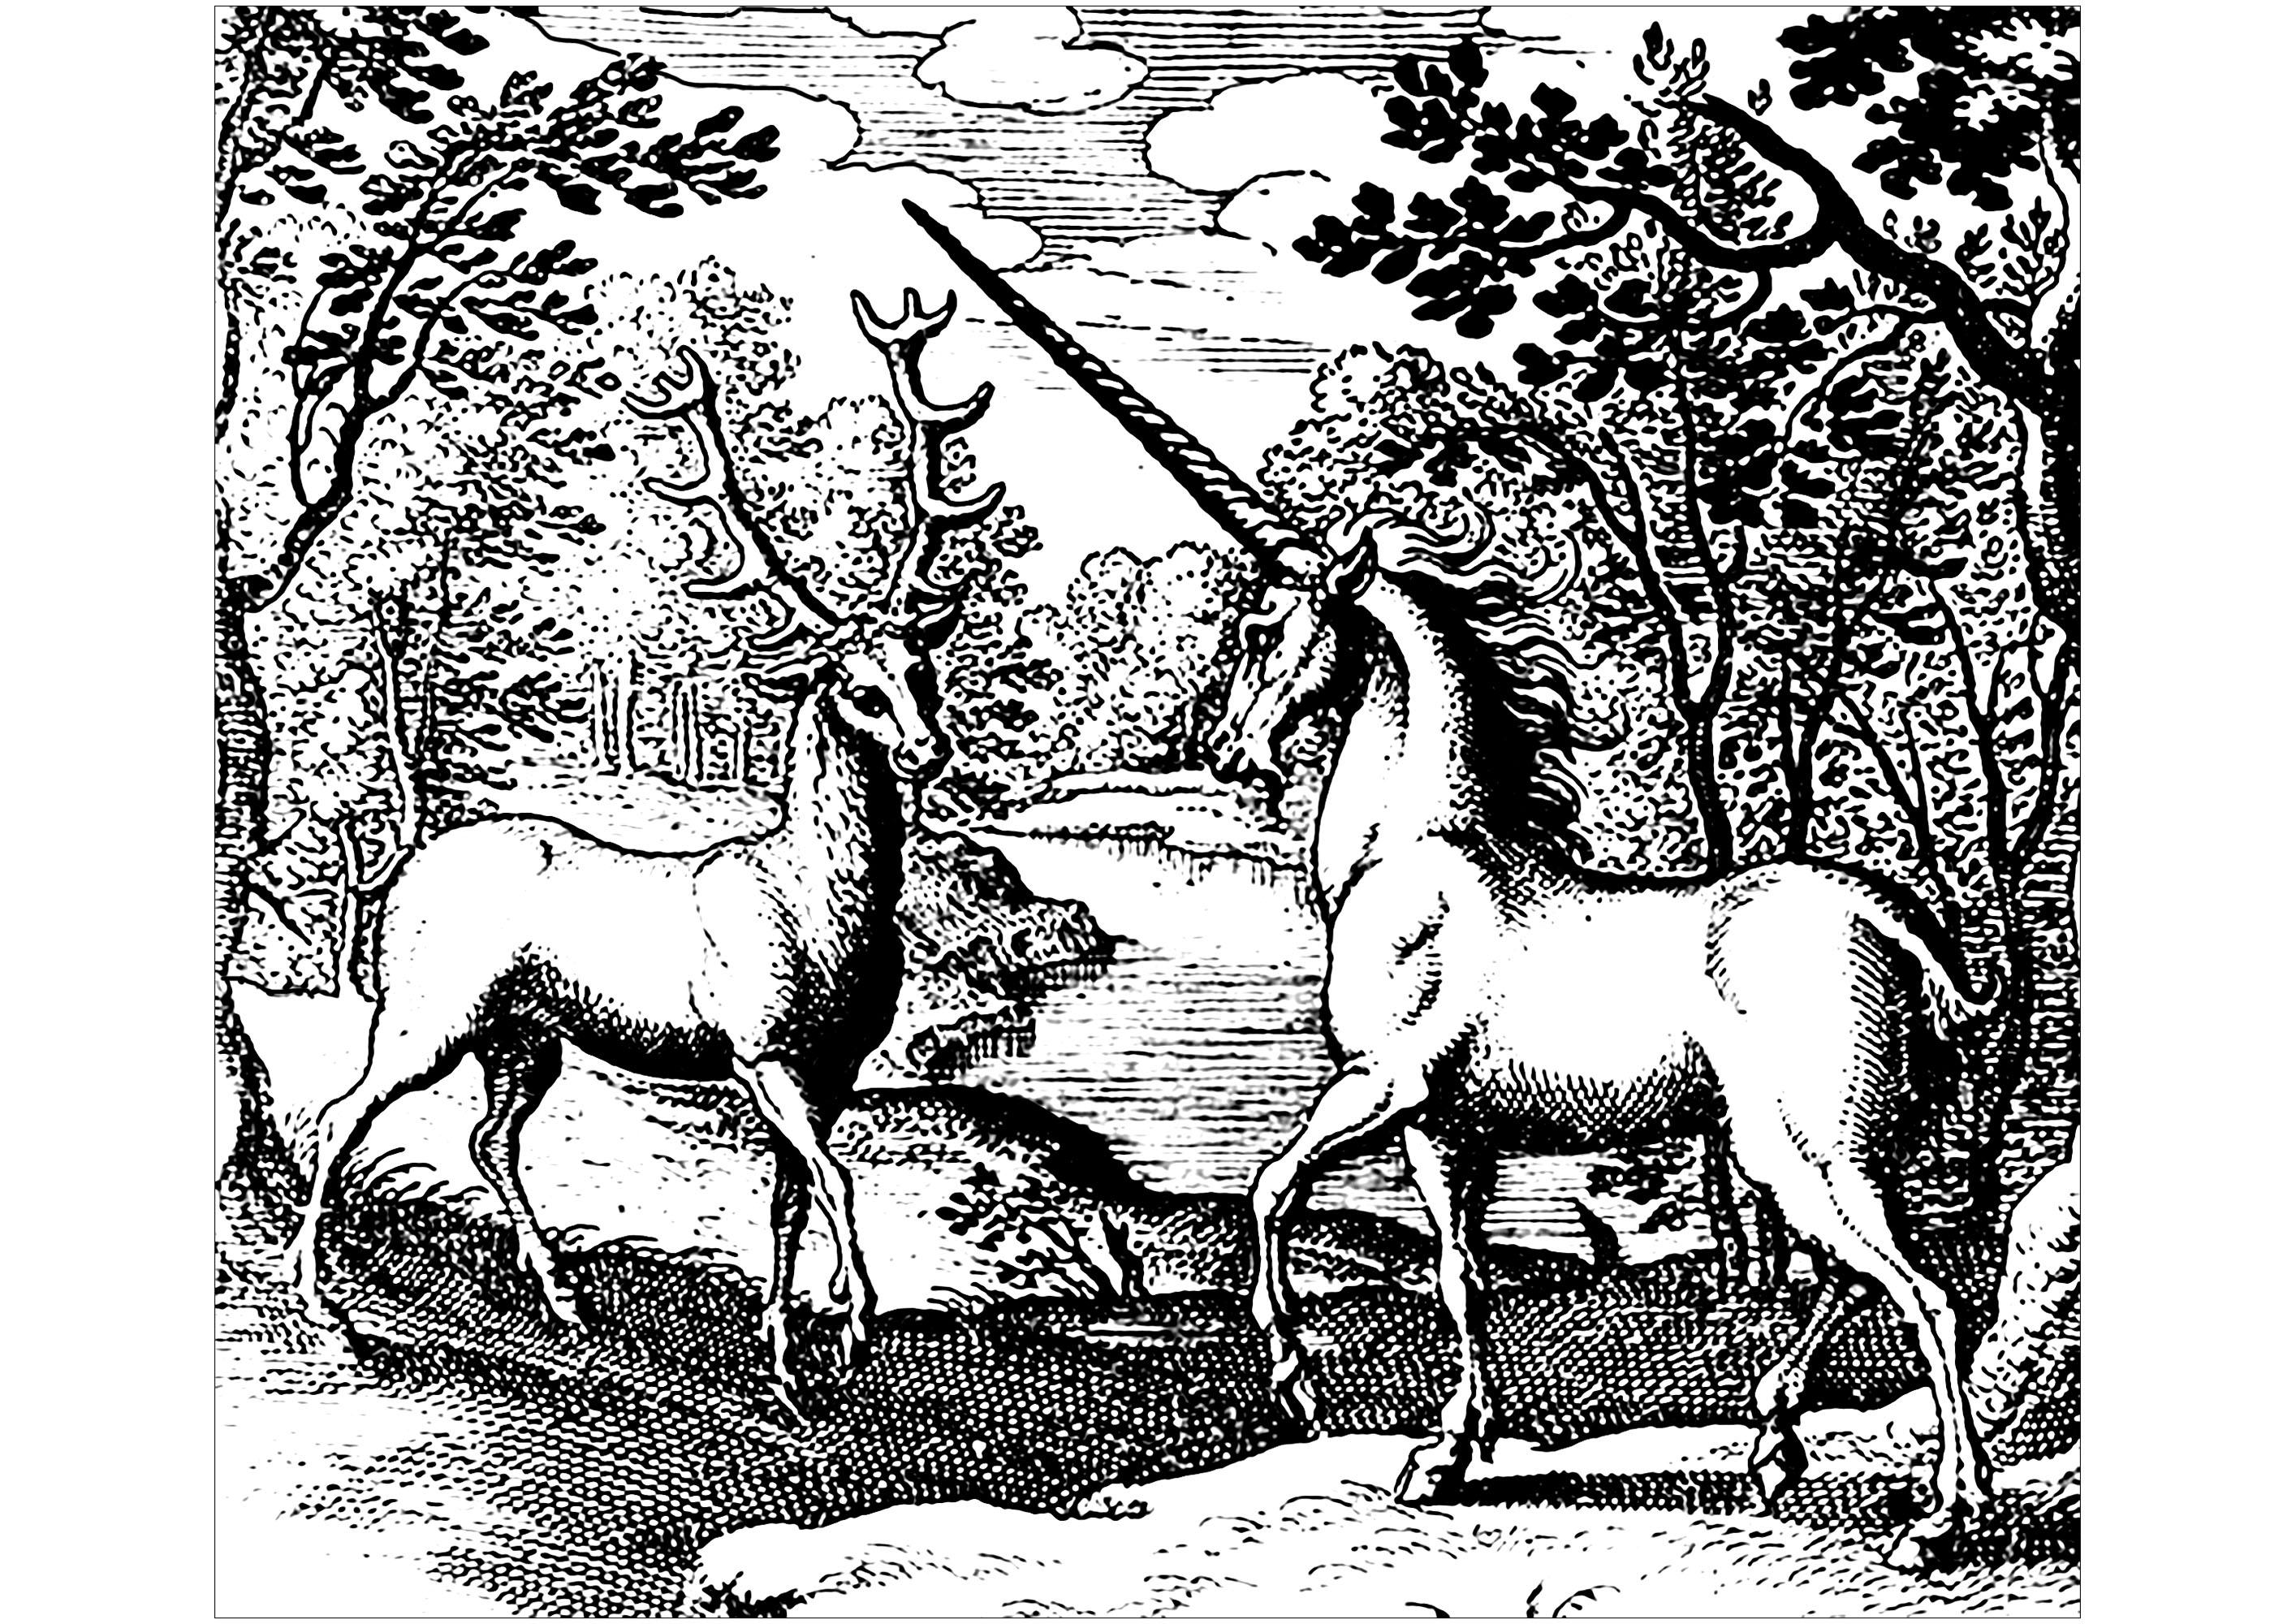 Einhorner 98182 - Einhörner - Malbuch Fur Erwachsene